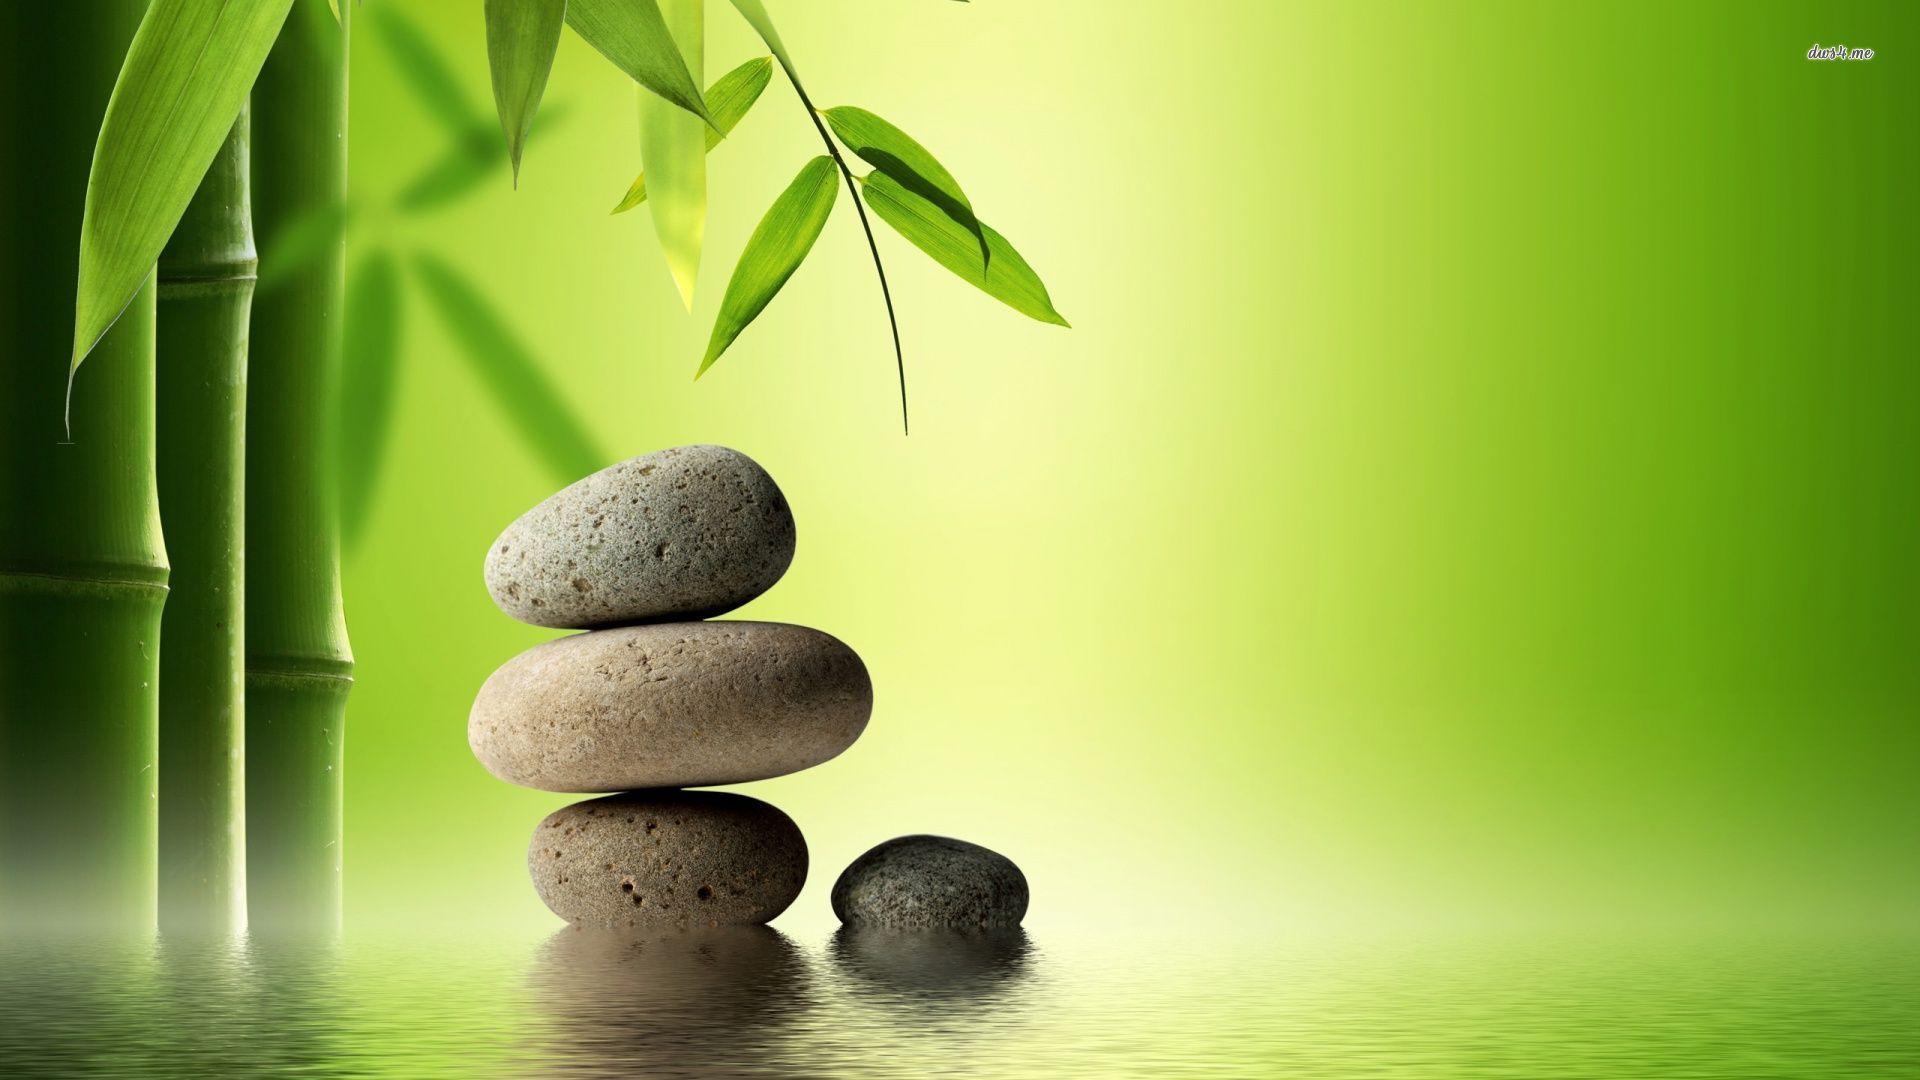 Free download Bamboo Zen Stone Wallpaper hd background hd